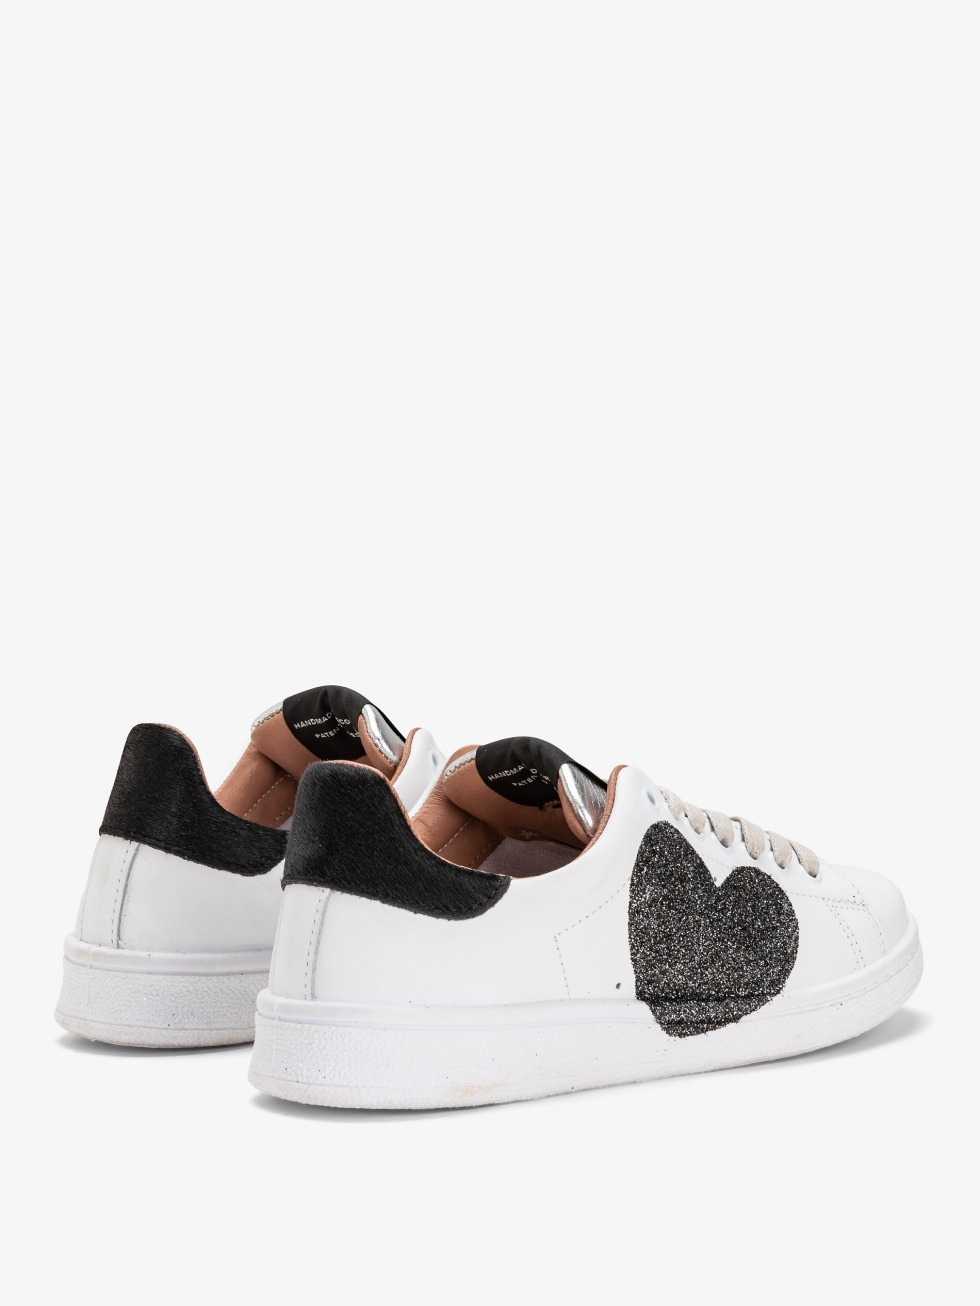 Daiquiri Sneakers - Black glitter Heart